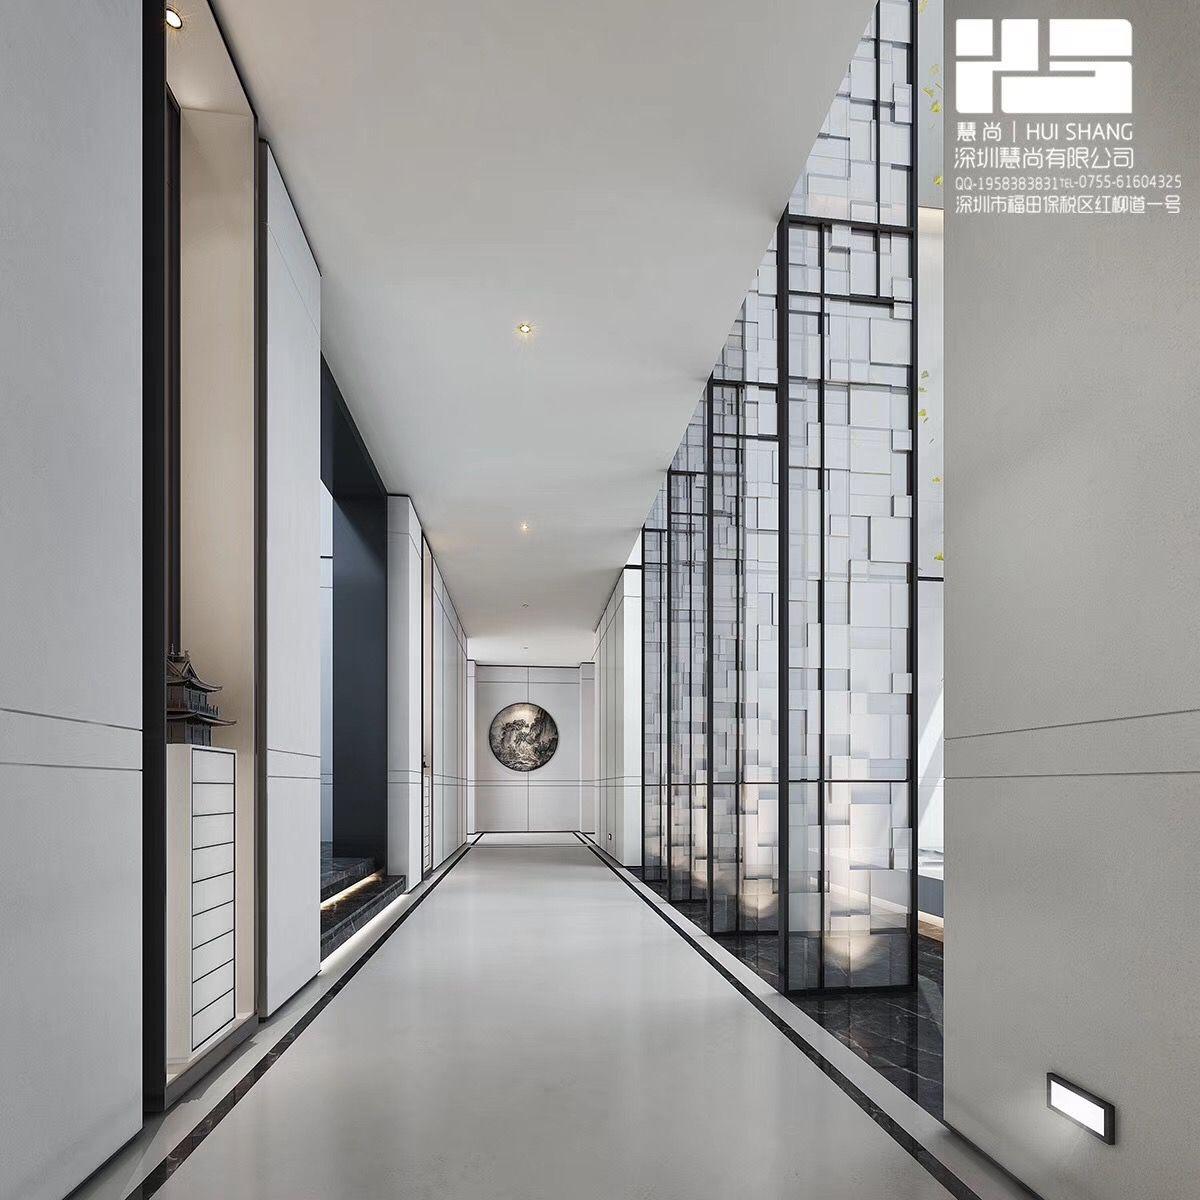 Corridor Design Ceiling: High Ceiling Corridor, Hallway, Screens, Asian